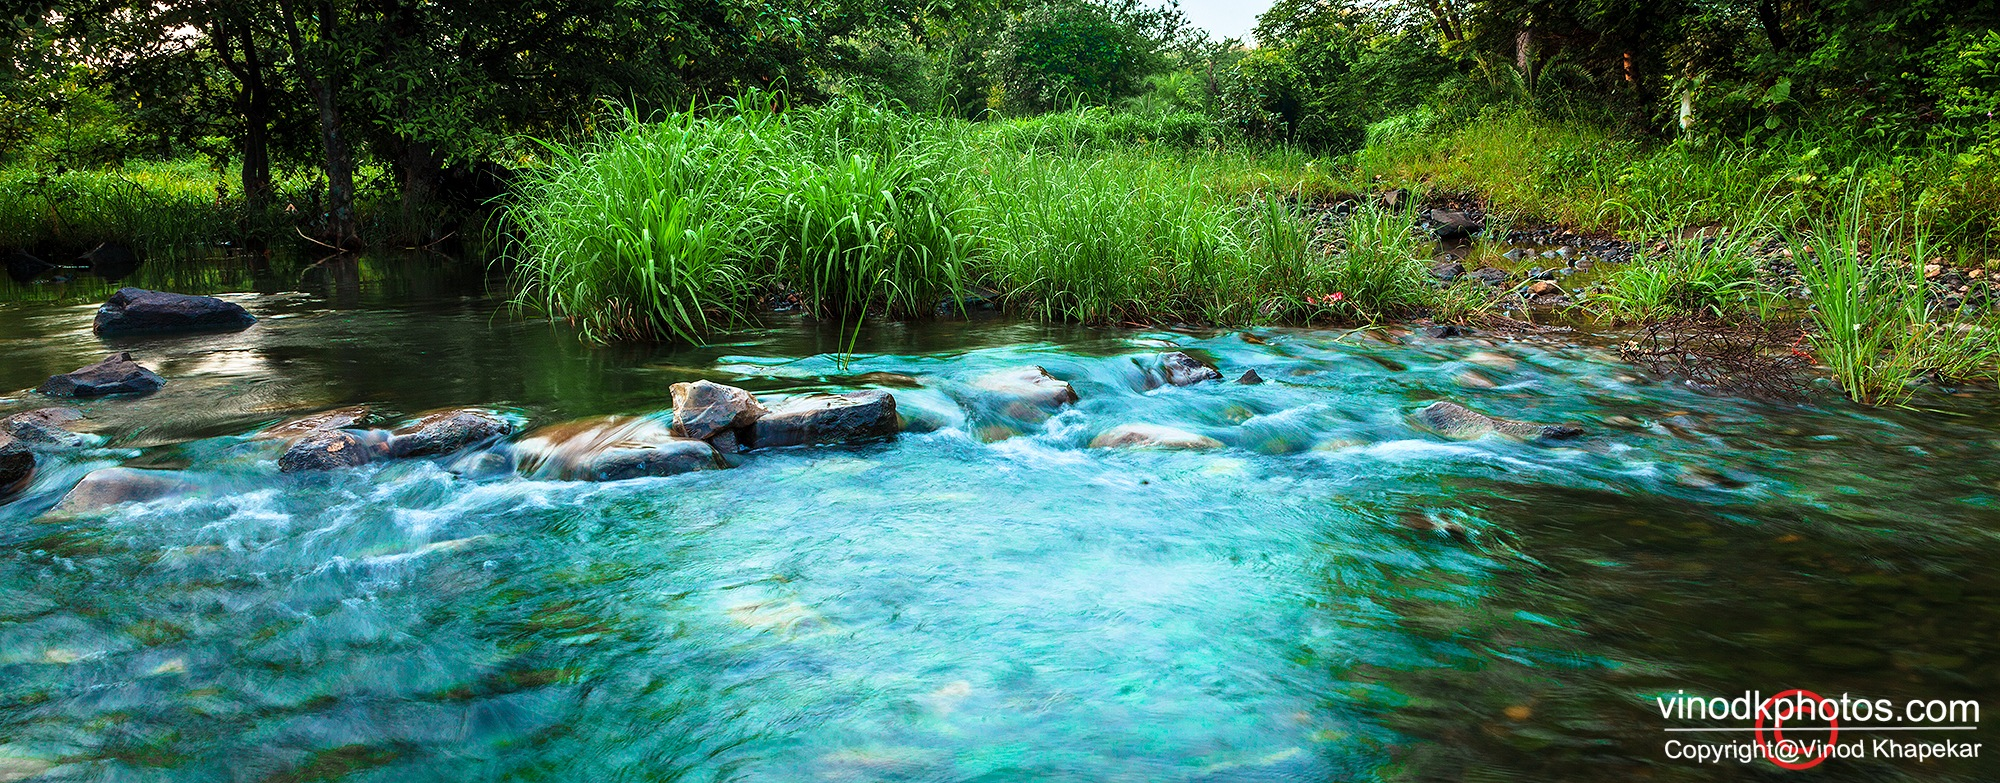 Blue Water !! by Vinod Khapekar